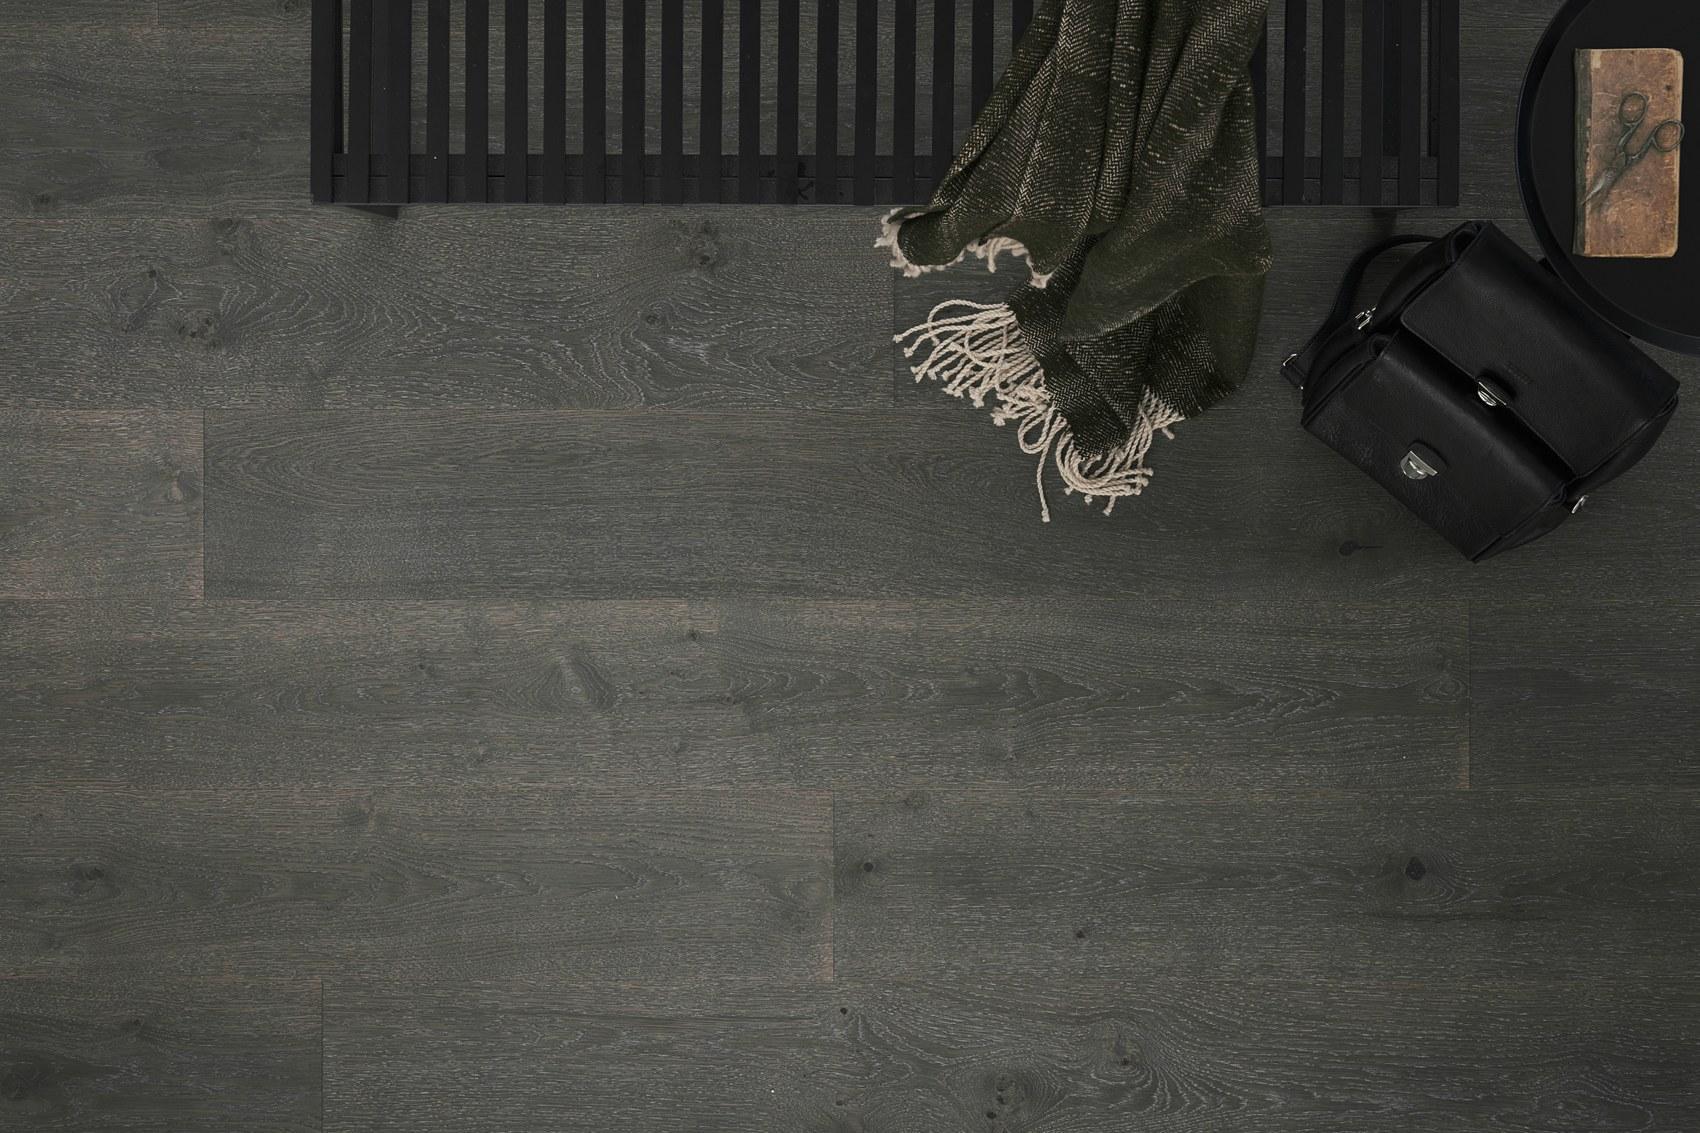 Timberwise-parketti-puulattia-wooden-floor-parquet-Tammi-Oak-Seaclam